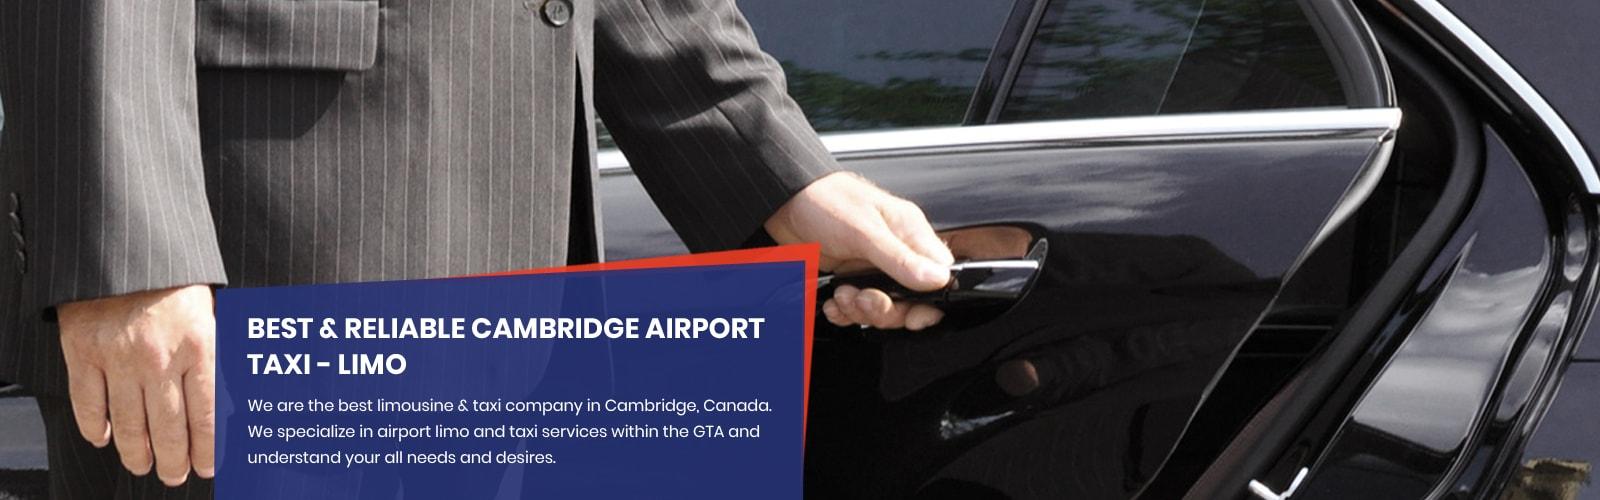 Cambridge Taxi Service, Waterloo Airport Taxi, Waterloo Limo Service, Limo Service In Cambridge, Cambridge Airport Taxi Service, Cambridge Airport Limo Service